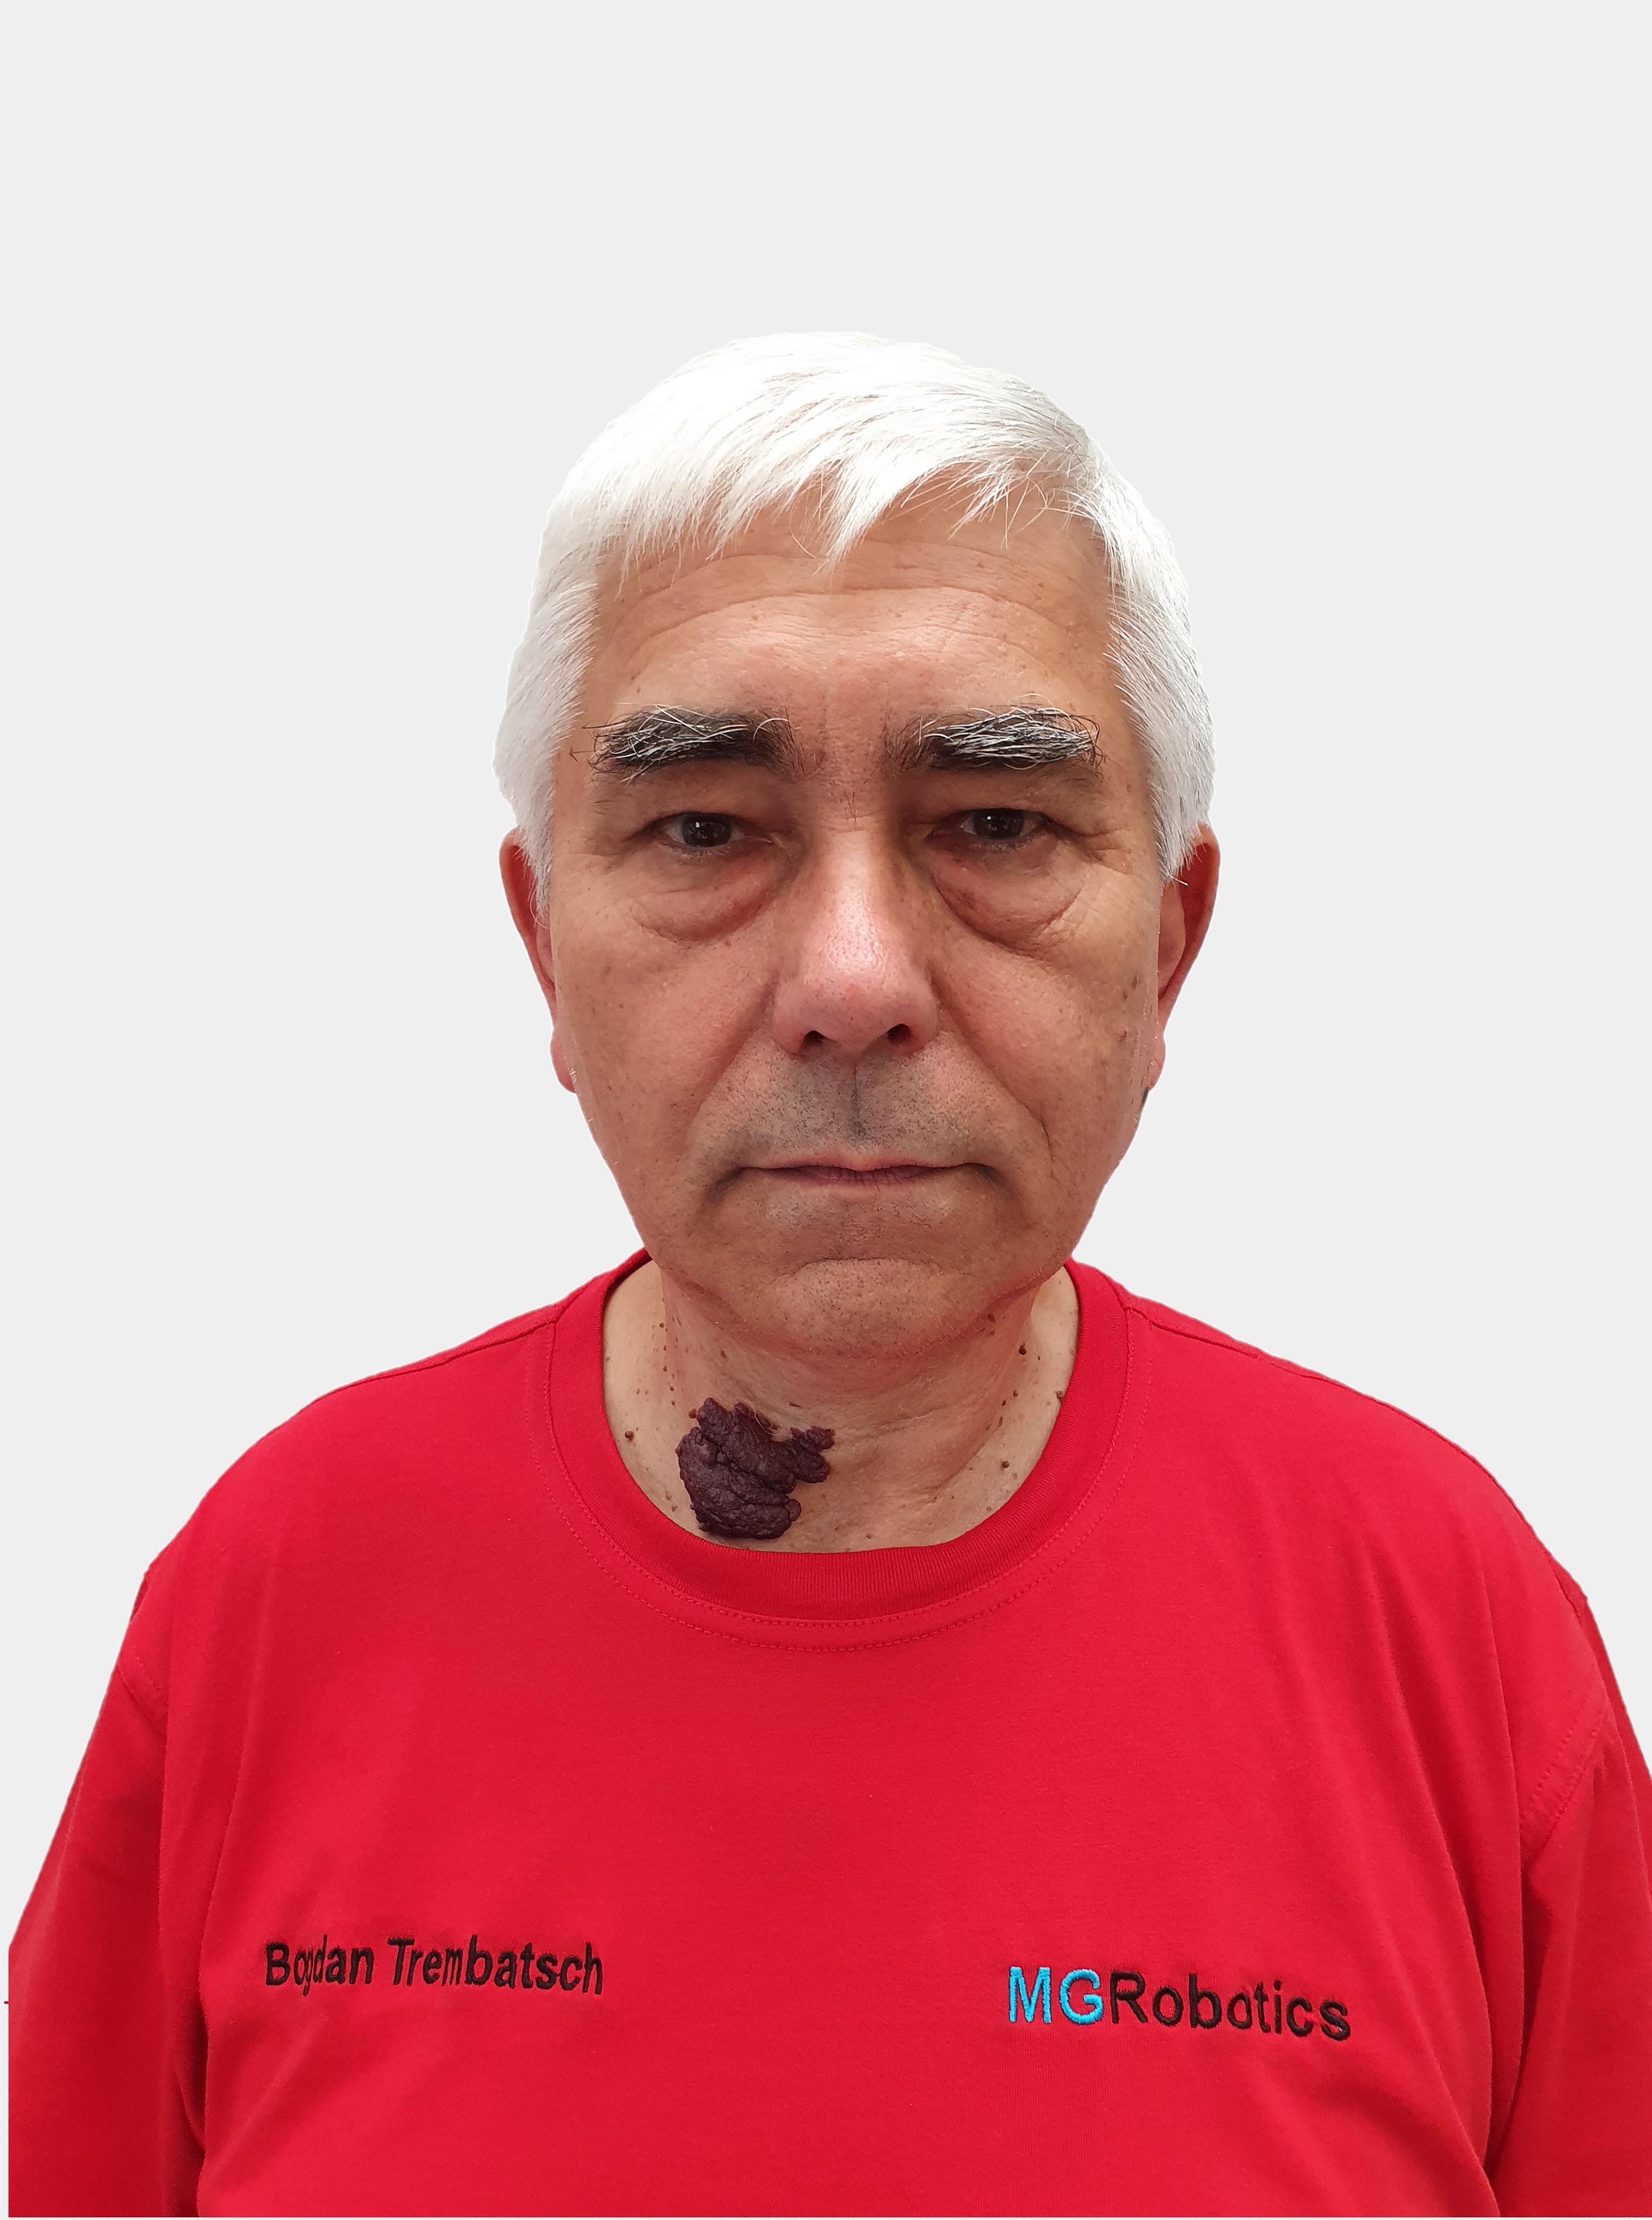 Bogdan Trembatsch